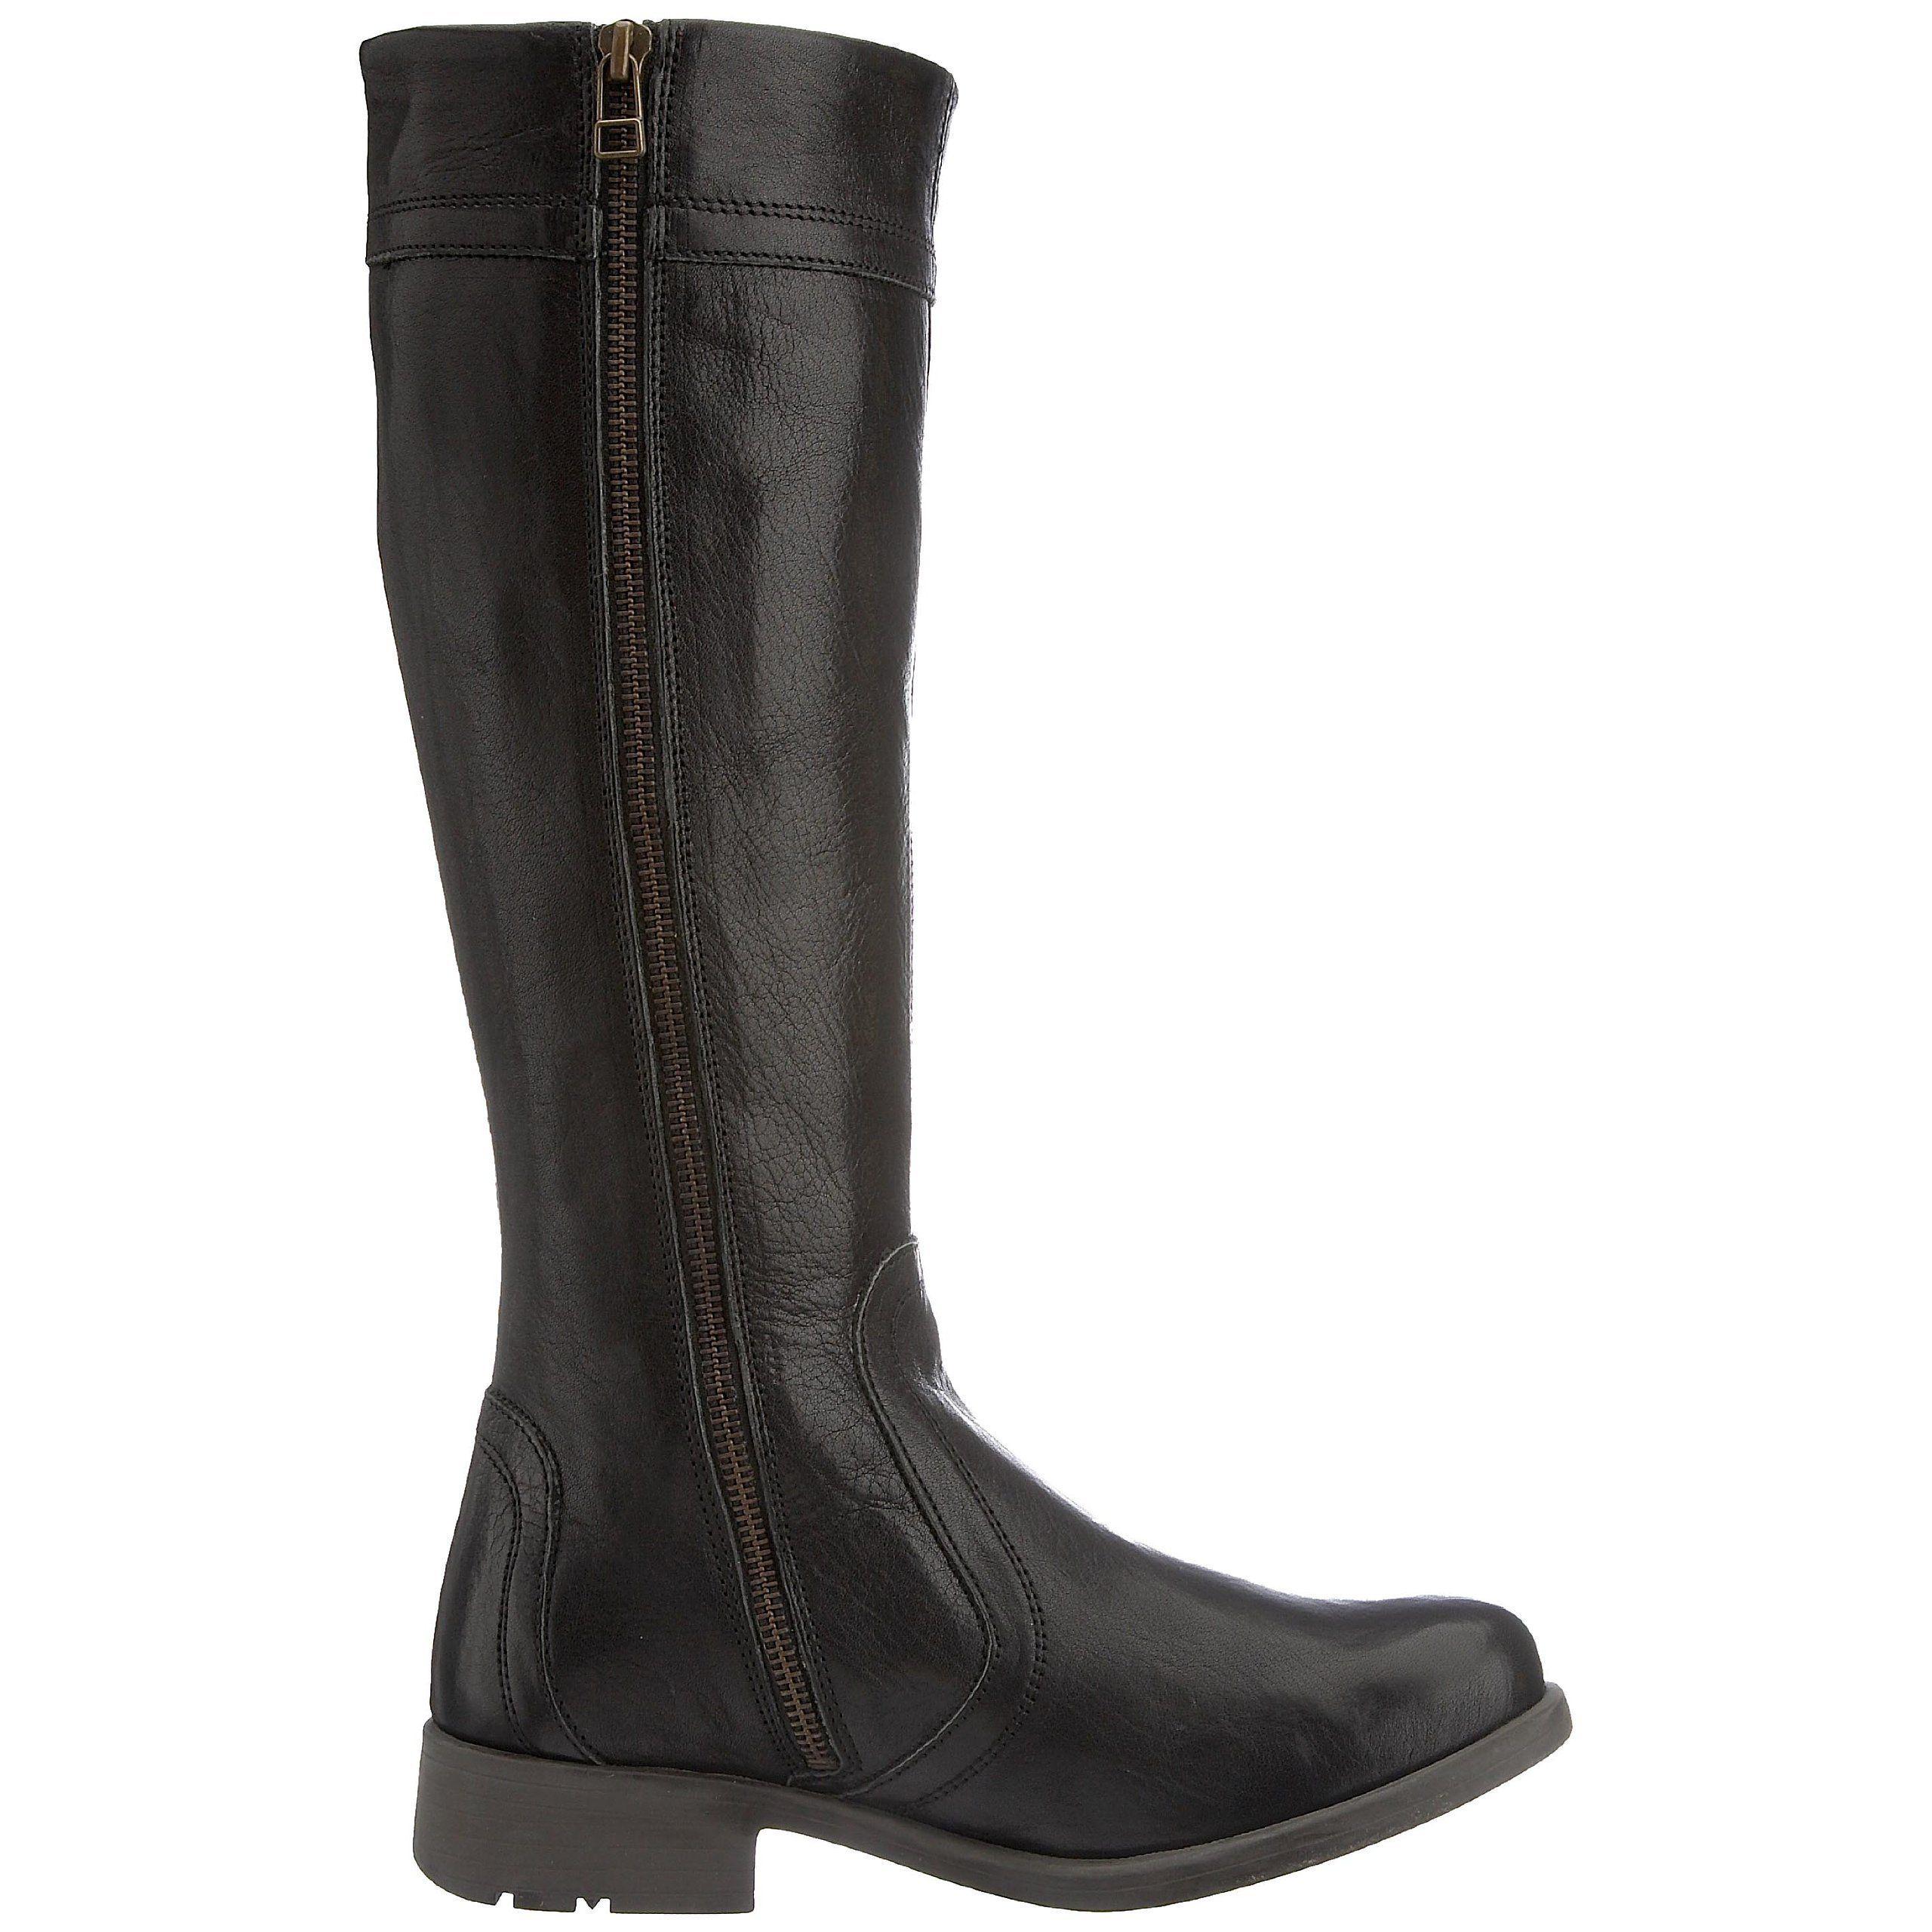 Camper Women's Knee-High Boots, Mexico Negro/Marti Raiz, Shoes, Leather, Black